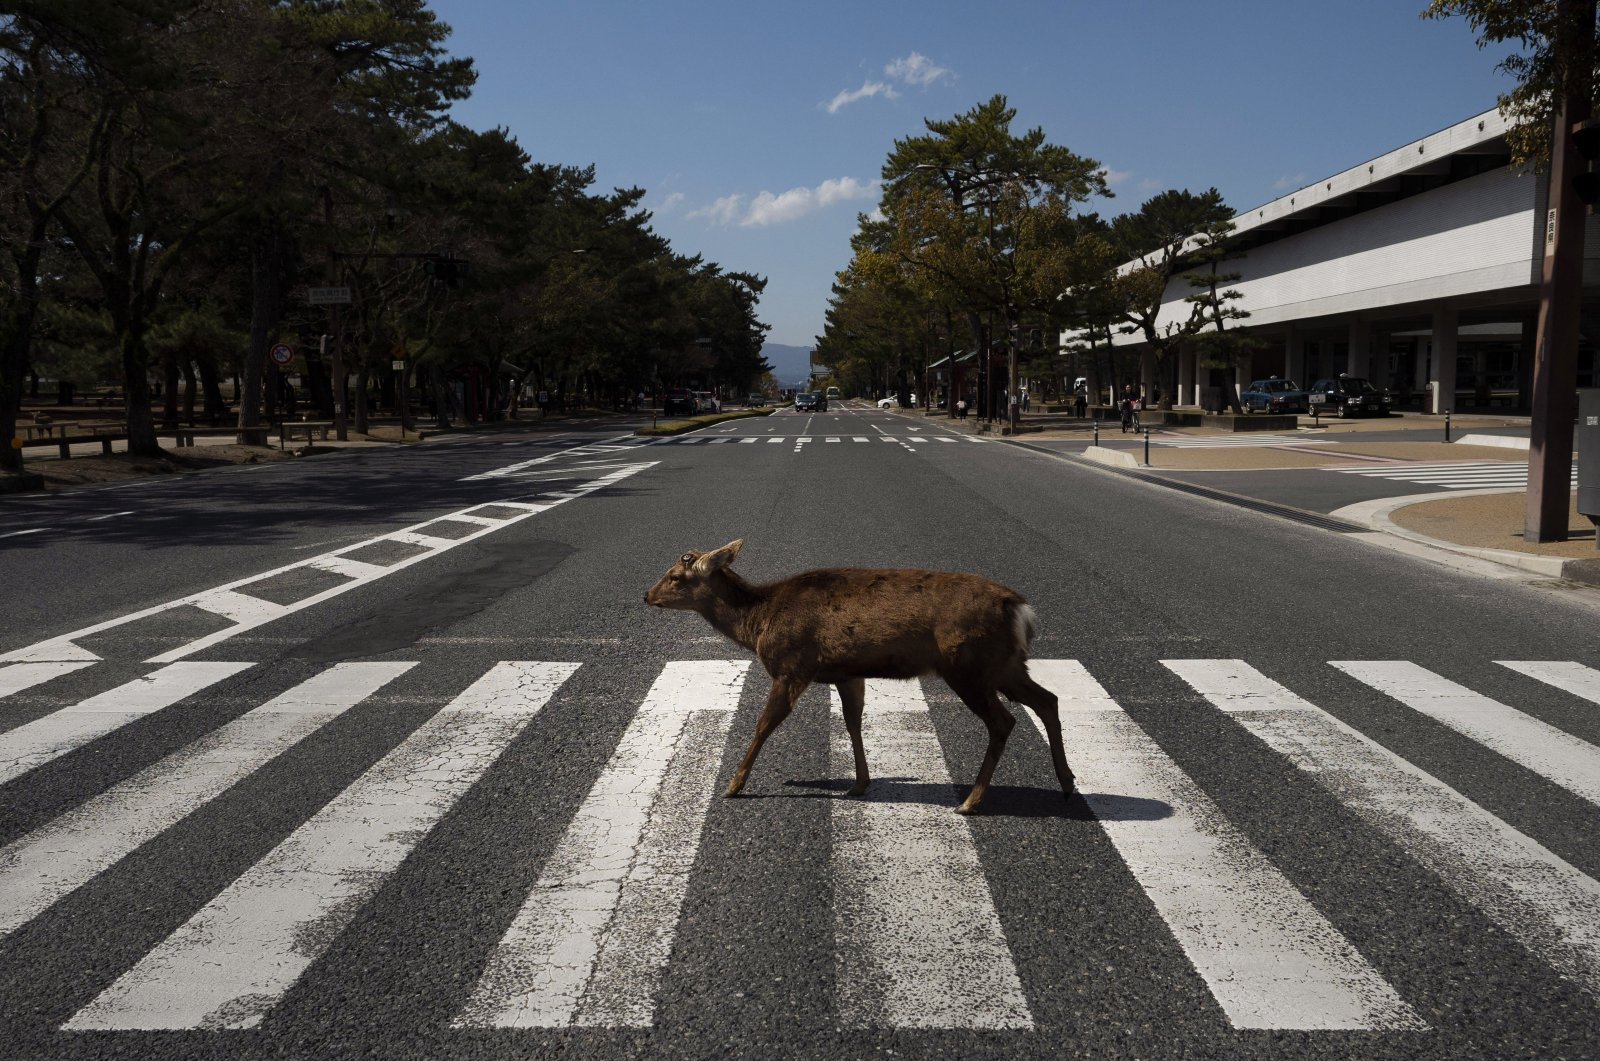 A deer walks across a pedestrian crossing in Nara, Japan, Thursday, March 19, 2020. (AP Photo)